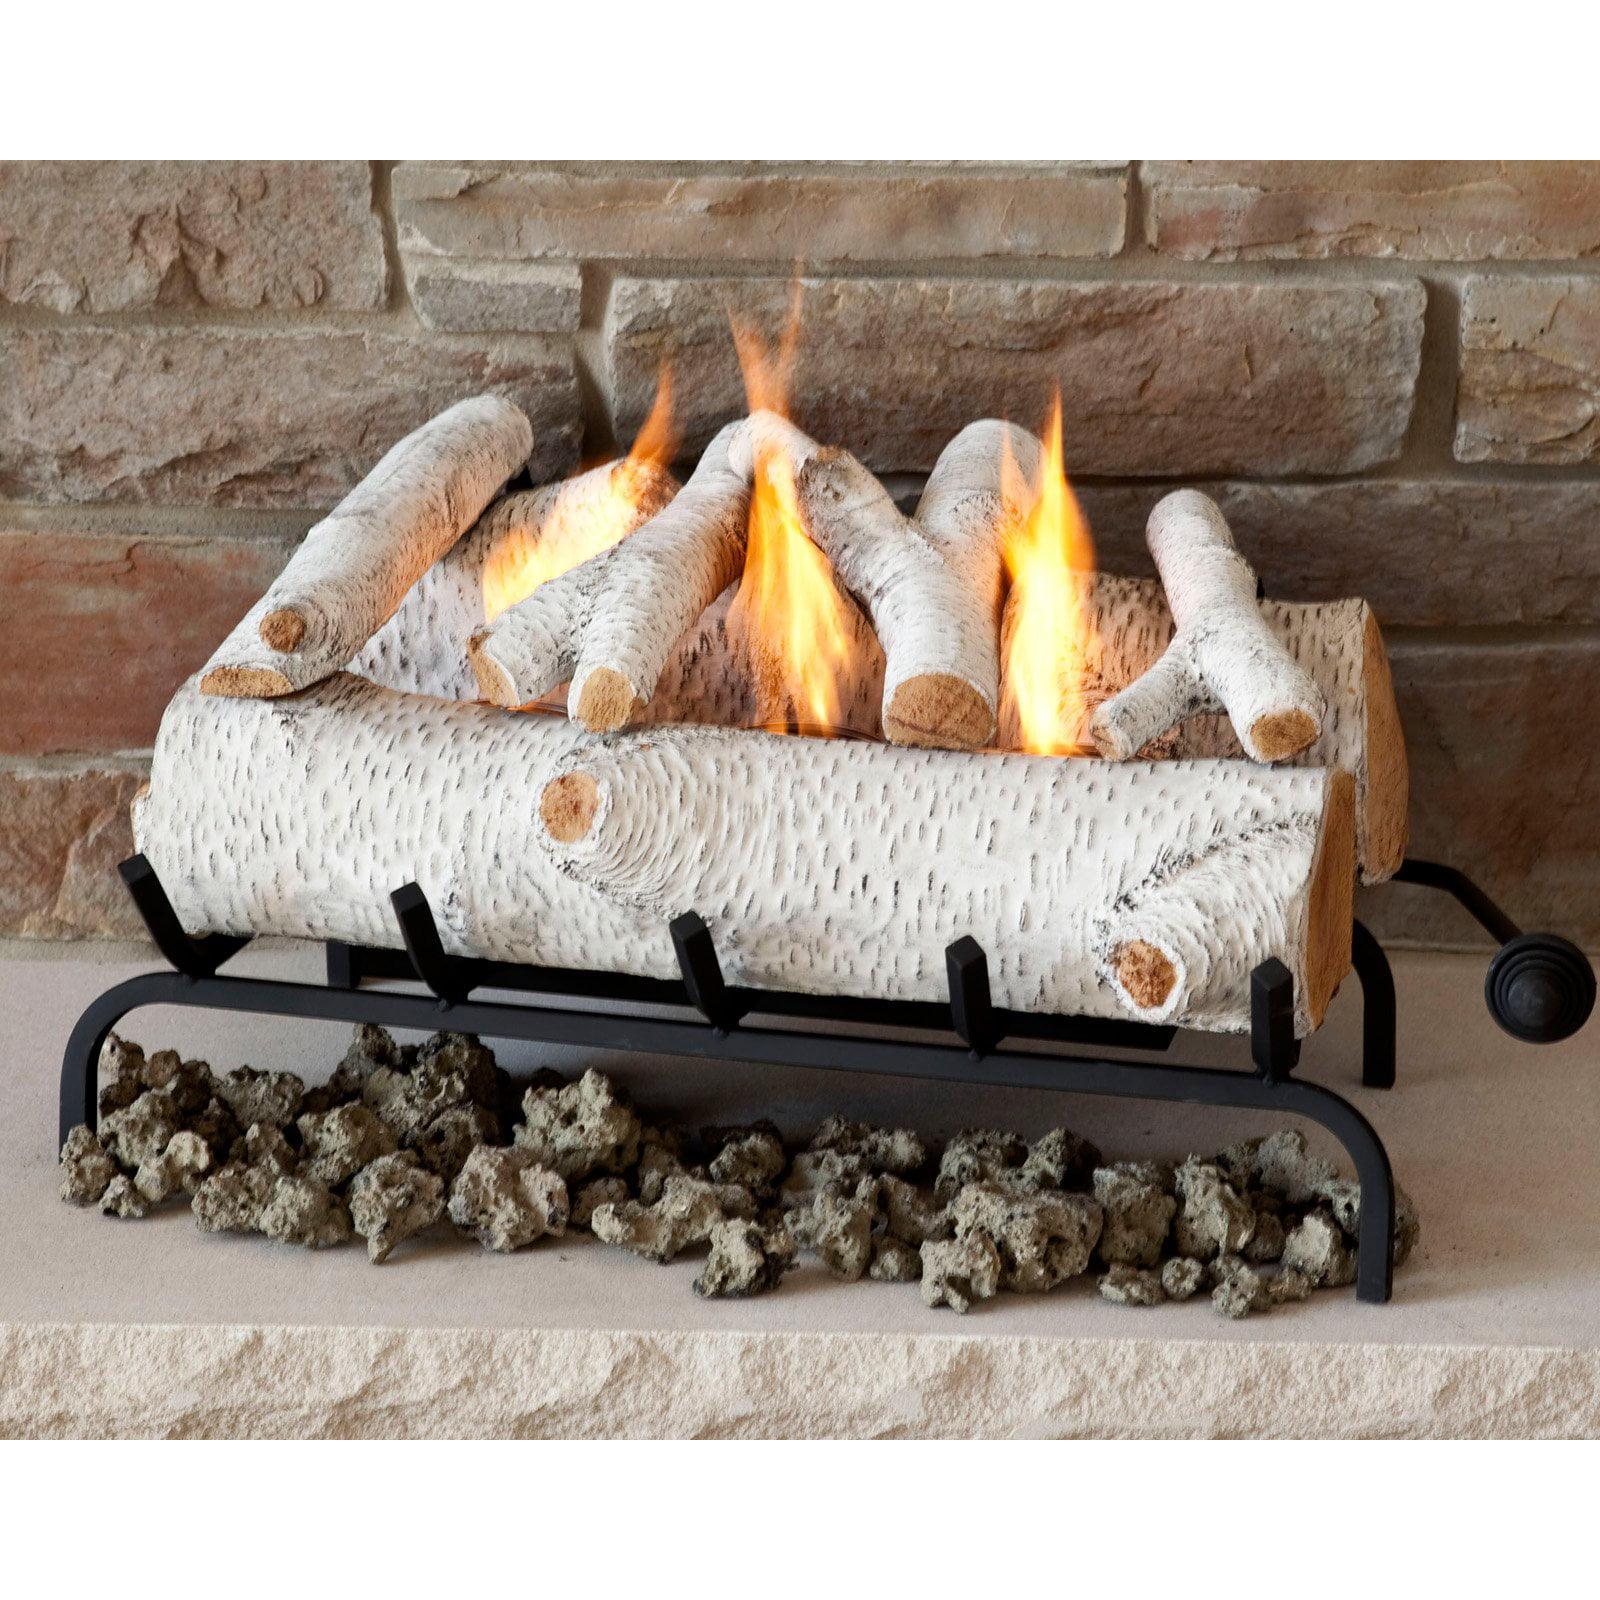 Real Flame 24 in. Convert to Gel Log Set- Birch